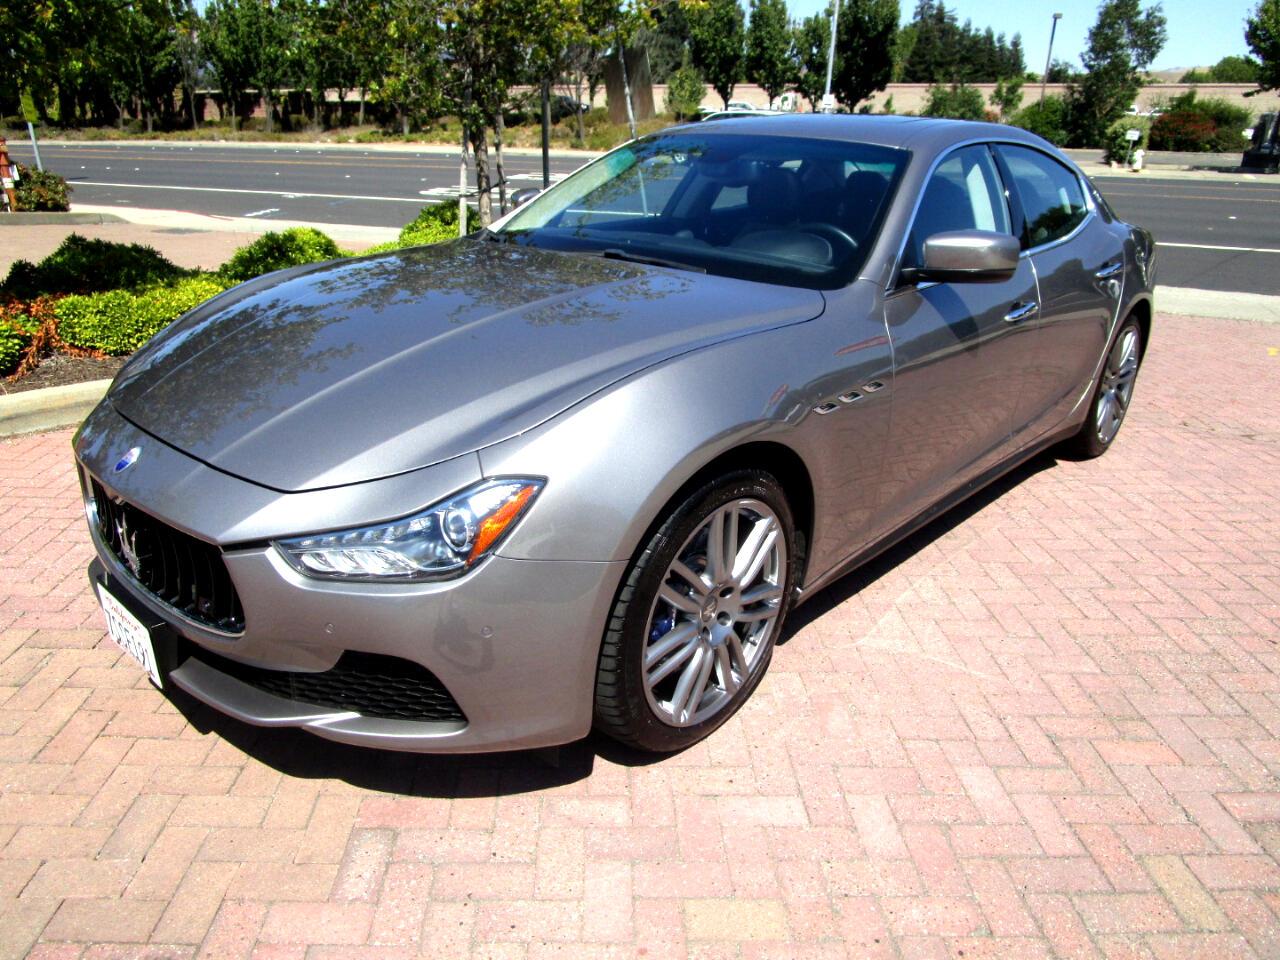 2016 Maserati Ghibli S TWIN TURBO**NAVI**HEAT SEATS**HK SOUND/SAT RADIO